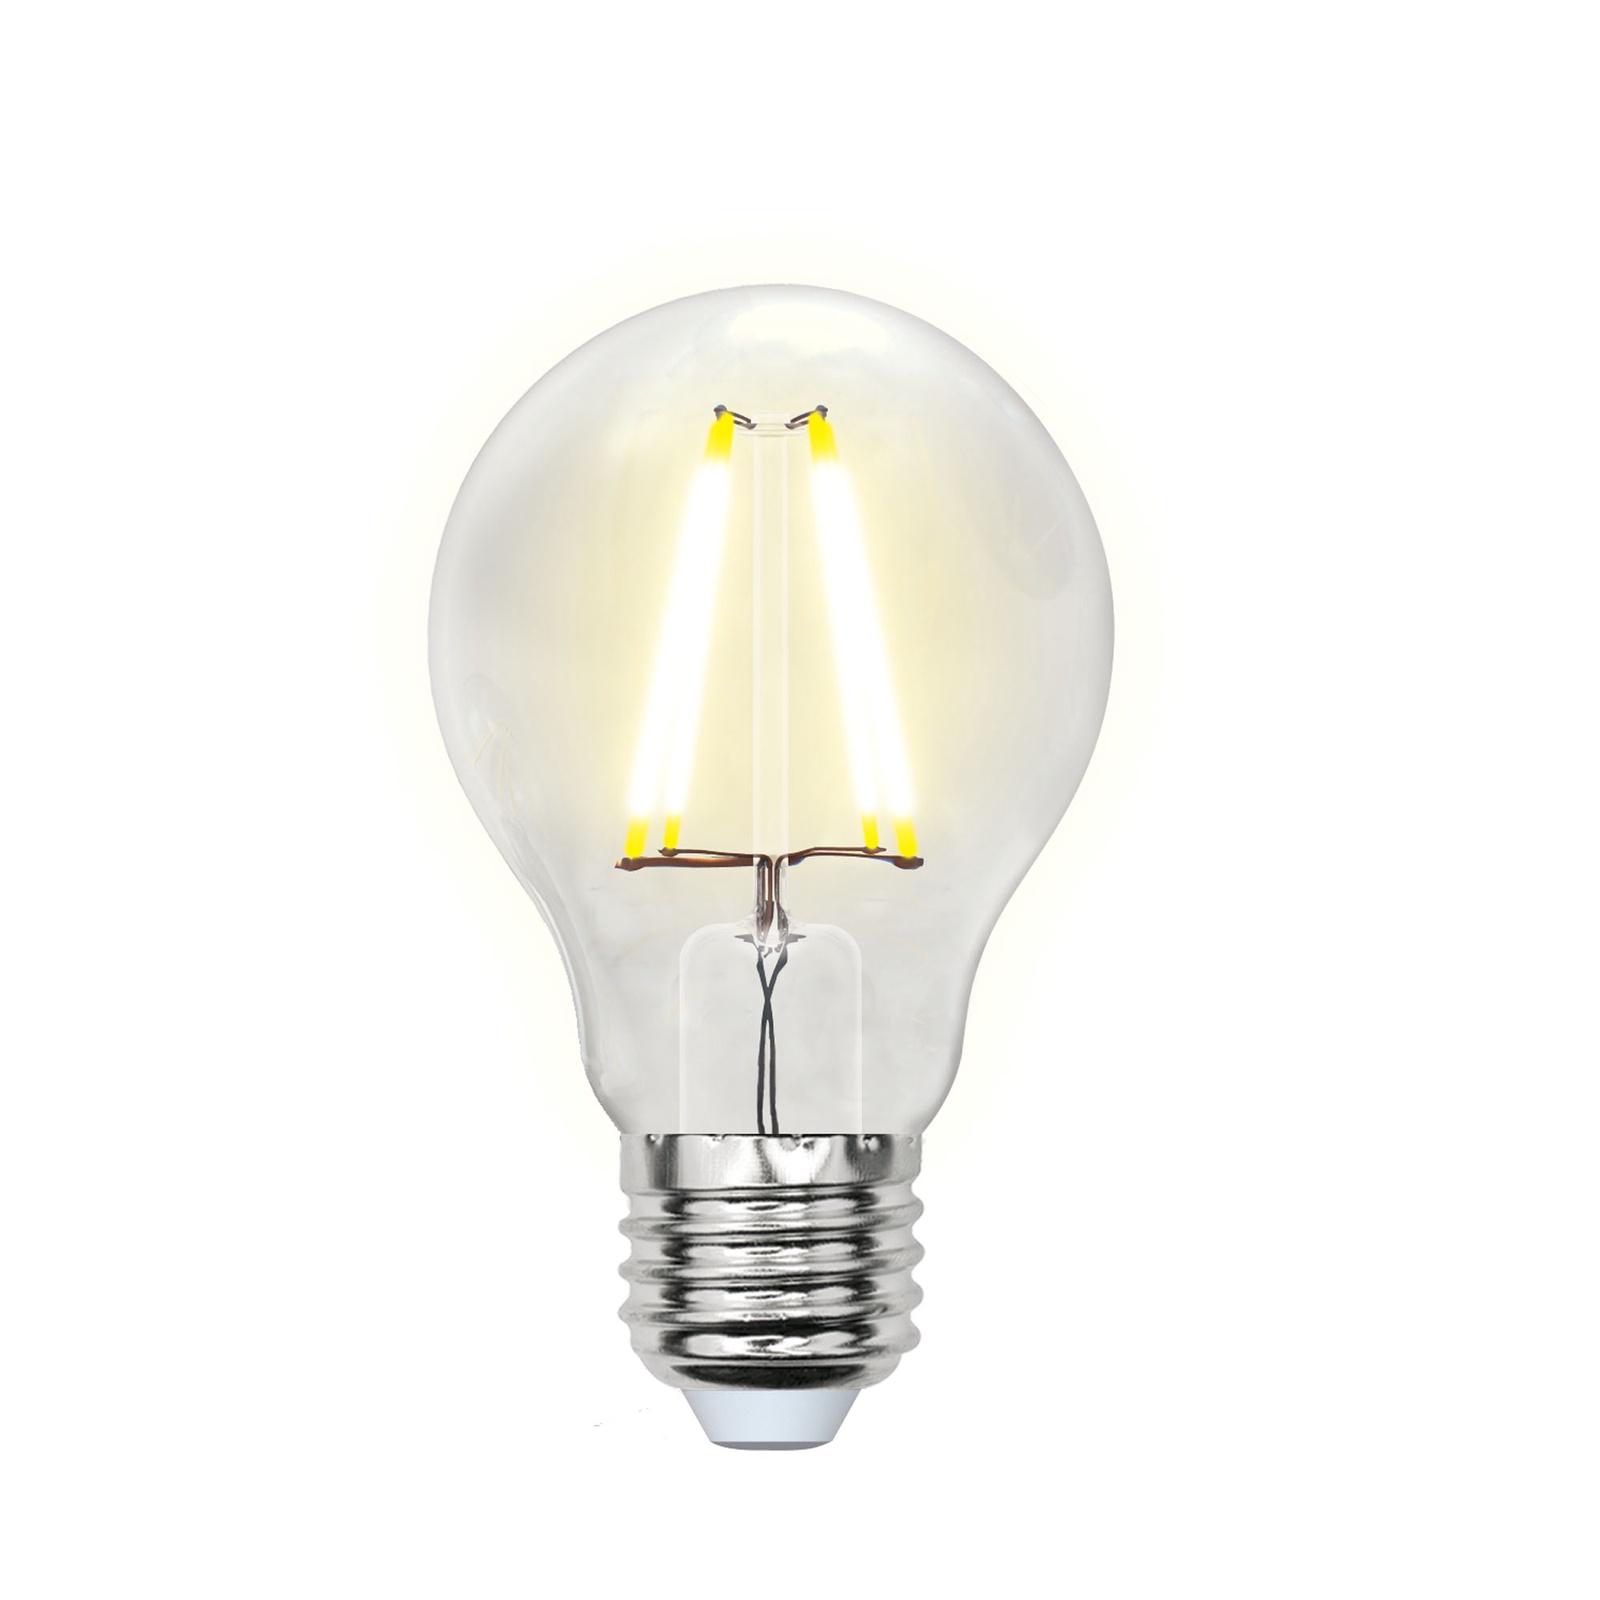 Лампочка Uniel LED-A60-8W/WW/E27/CL 3000K, Теплый свет 8 Вт, Светодиодная